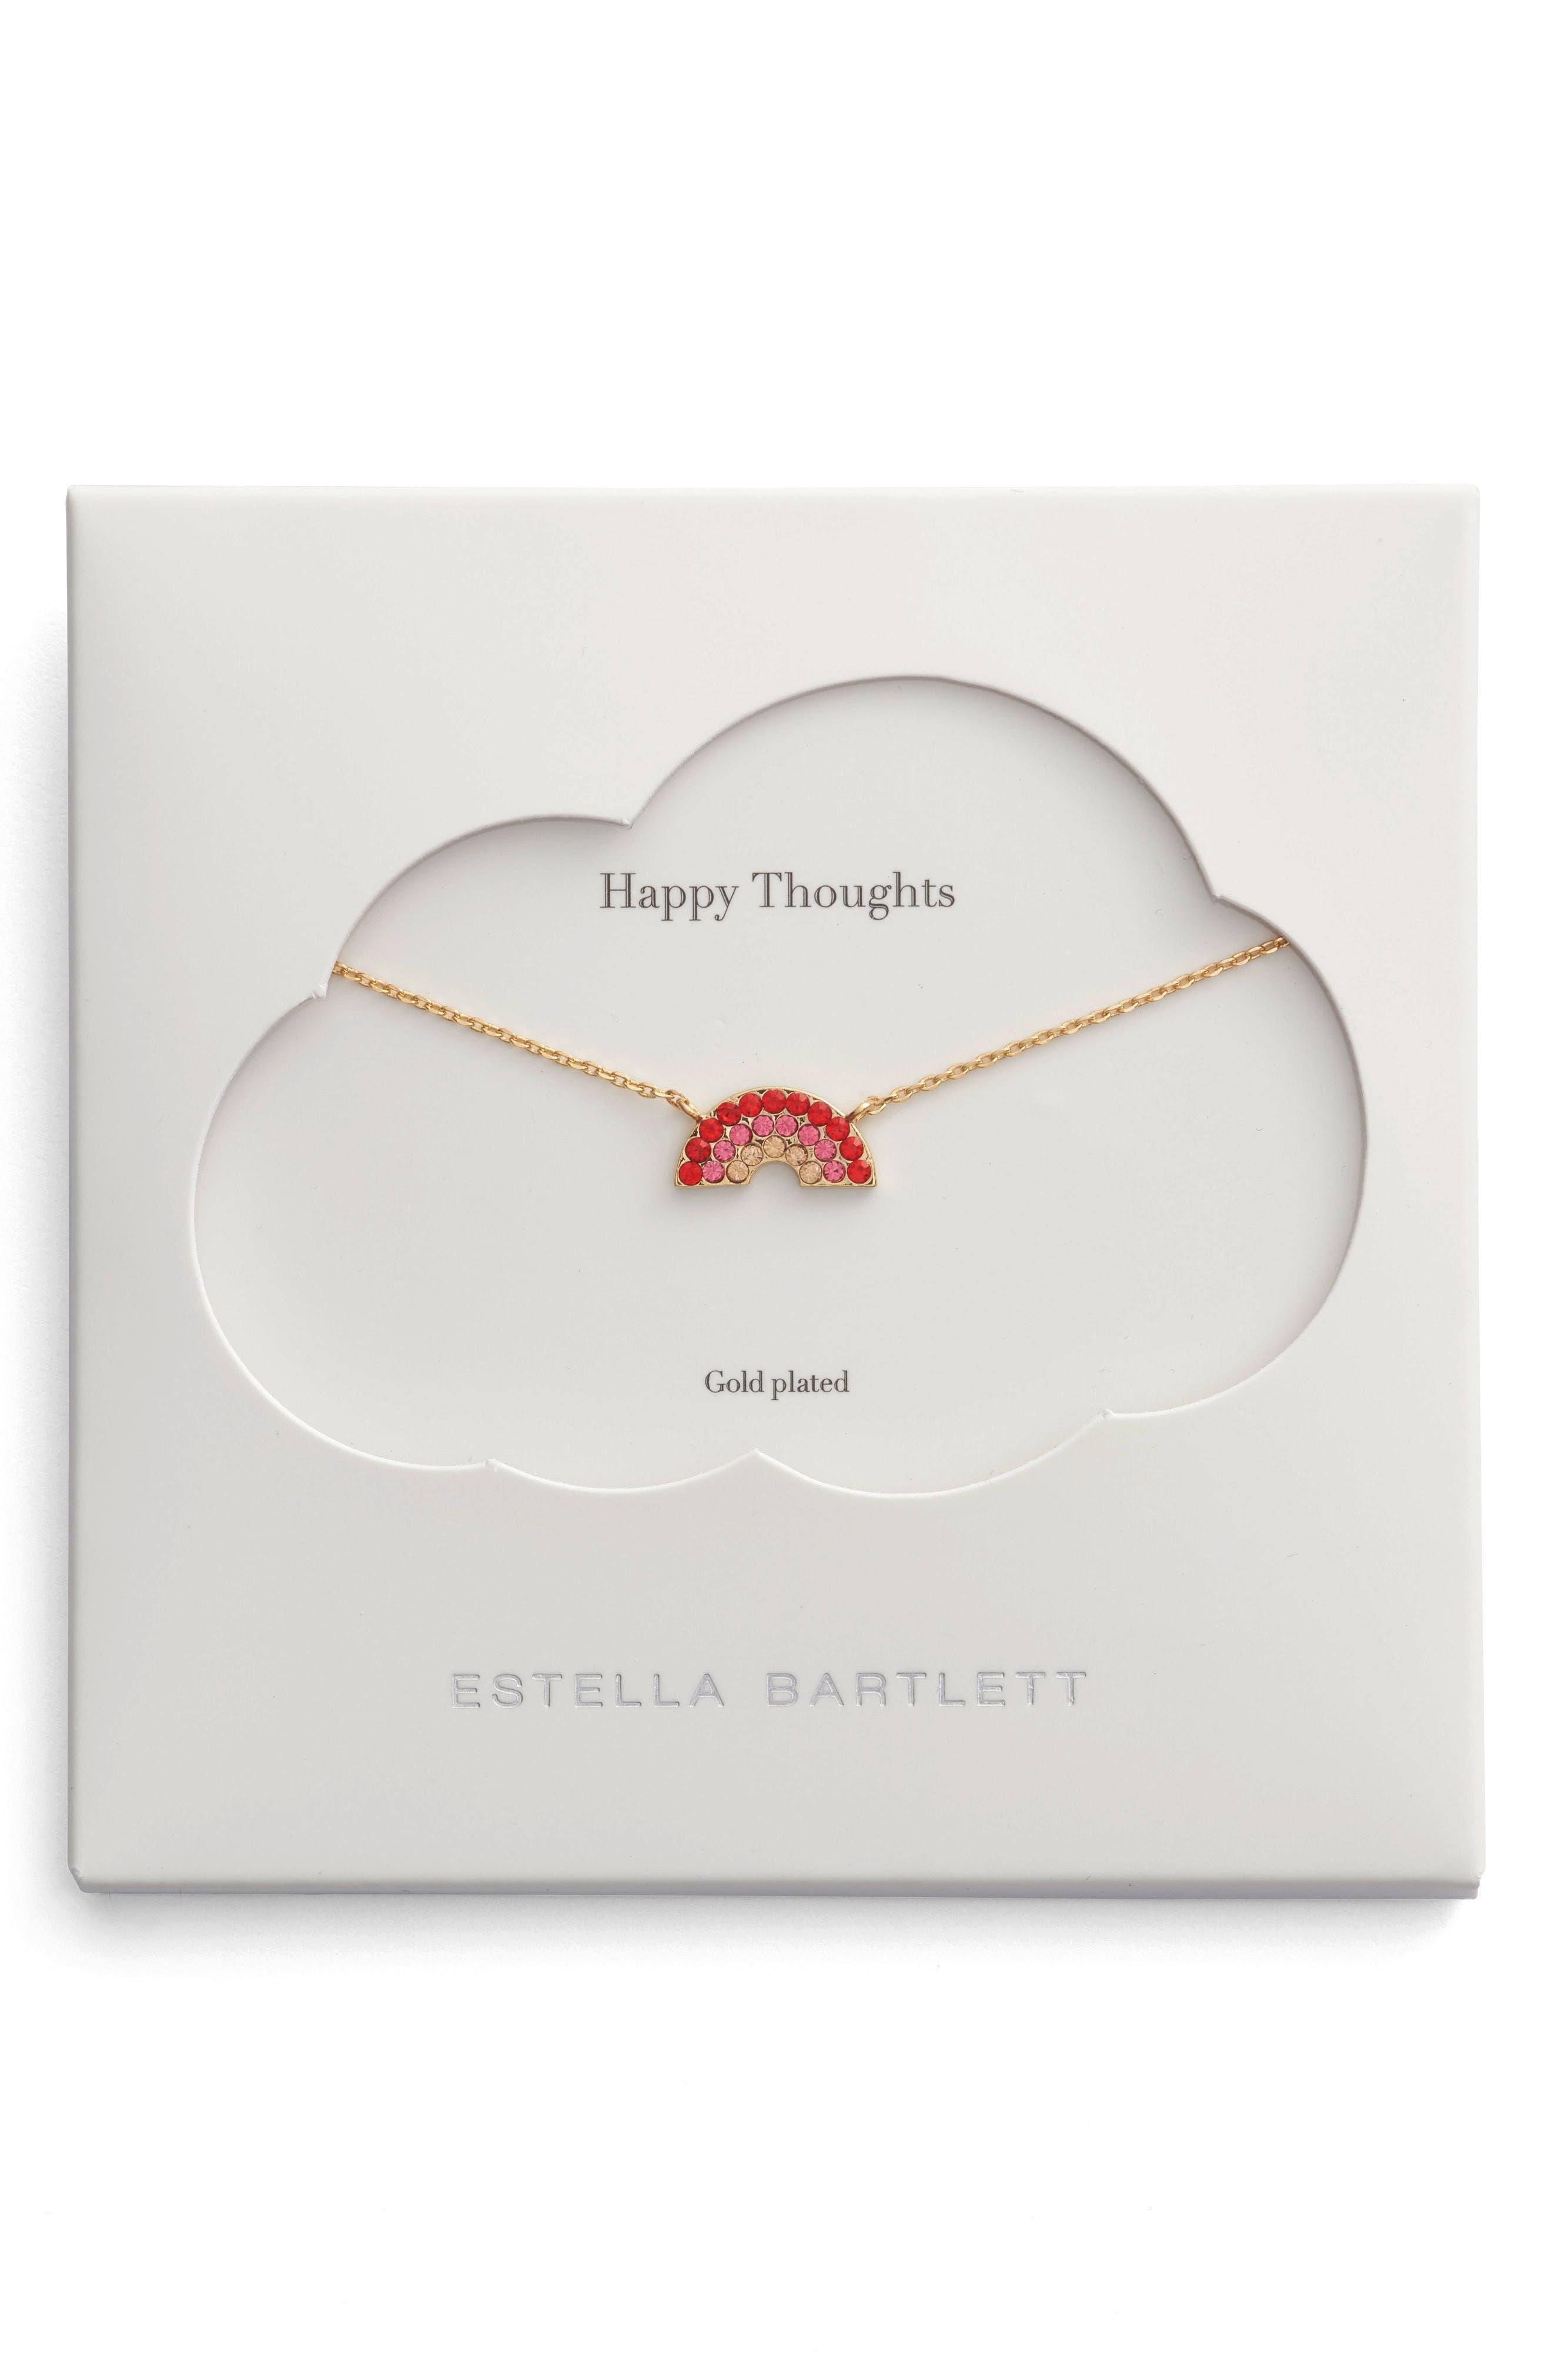 Main Image - Estella Bartlett Happy Thoughts Rainbow Necklace